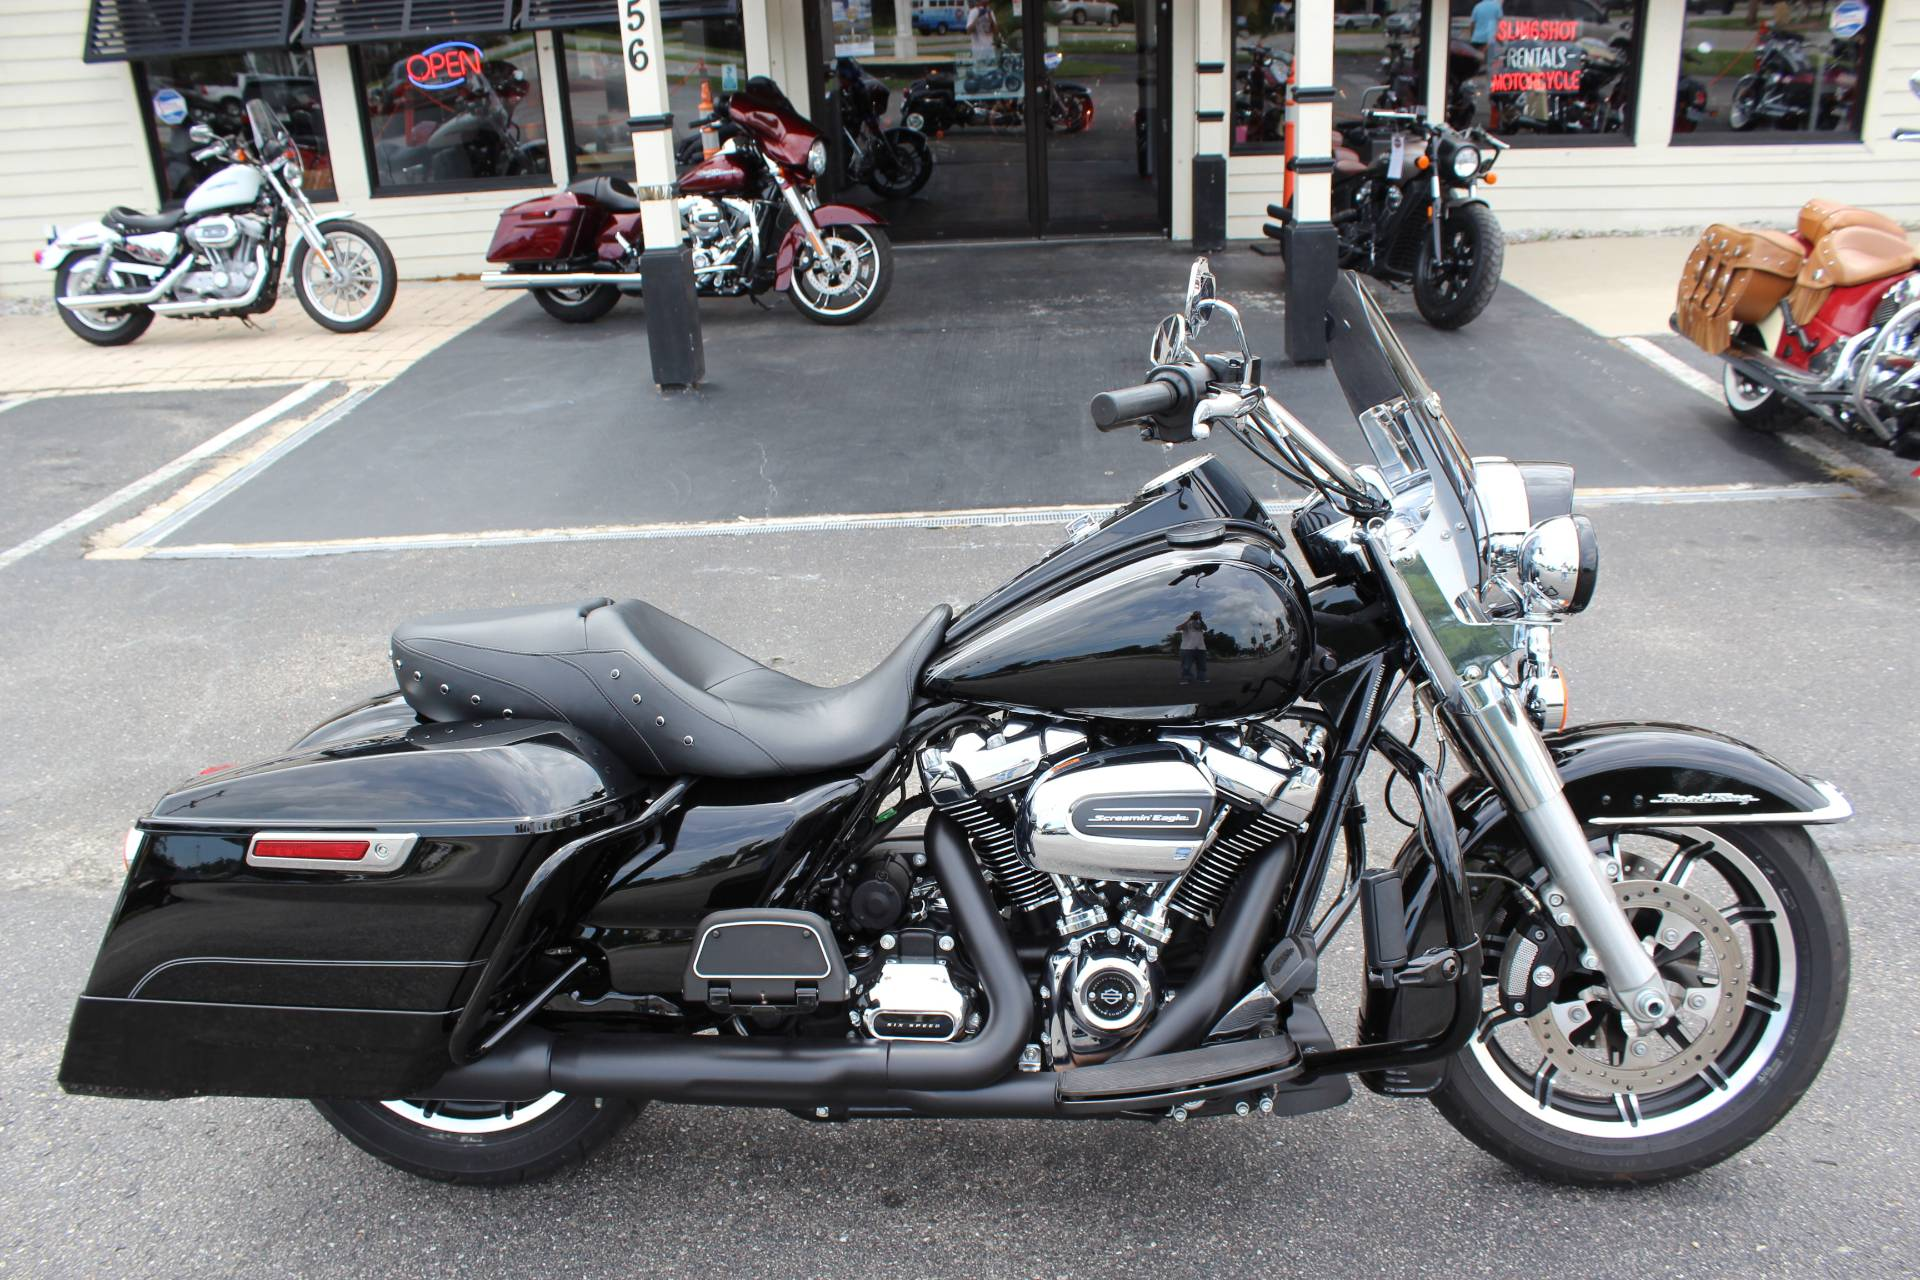 2017 Harley-Davidson Road King® in Murrells Inlet, South Carolina